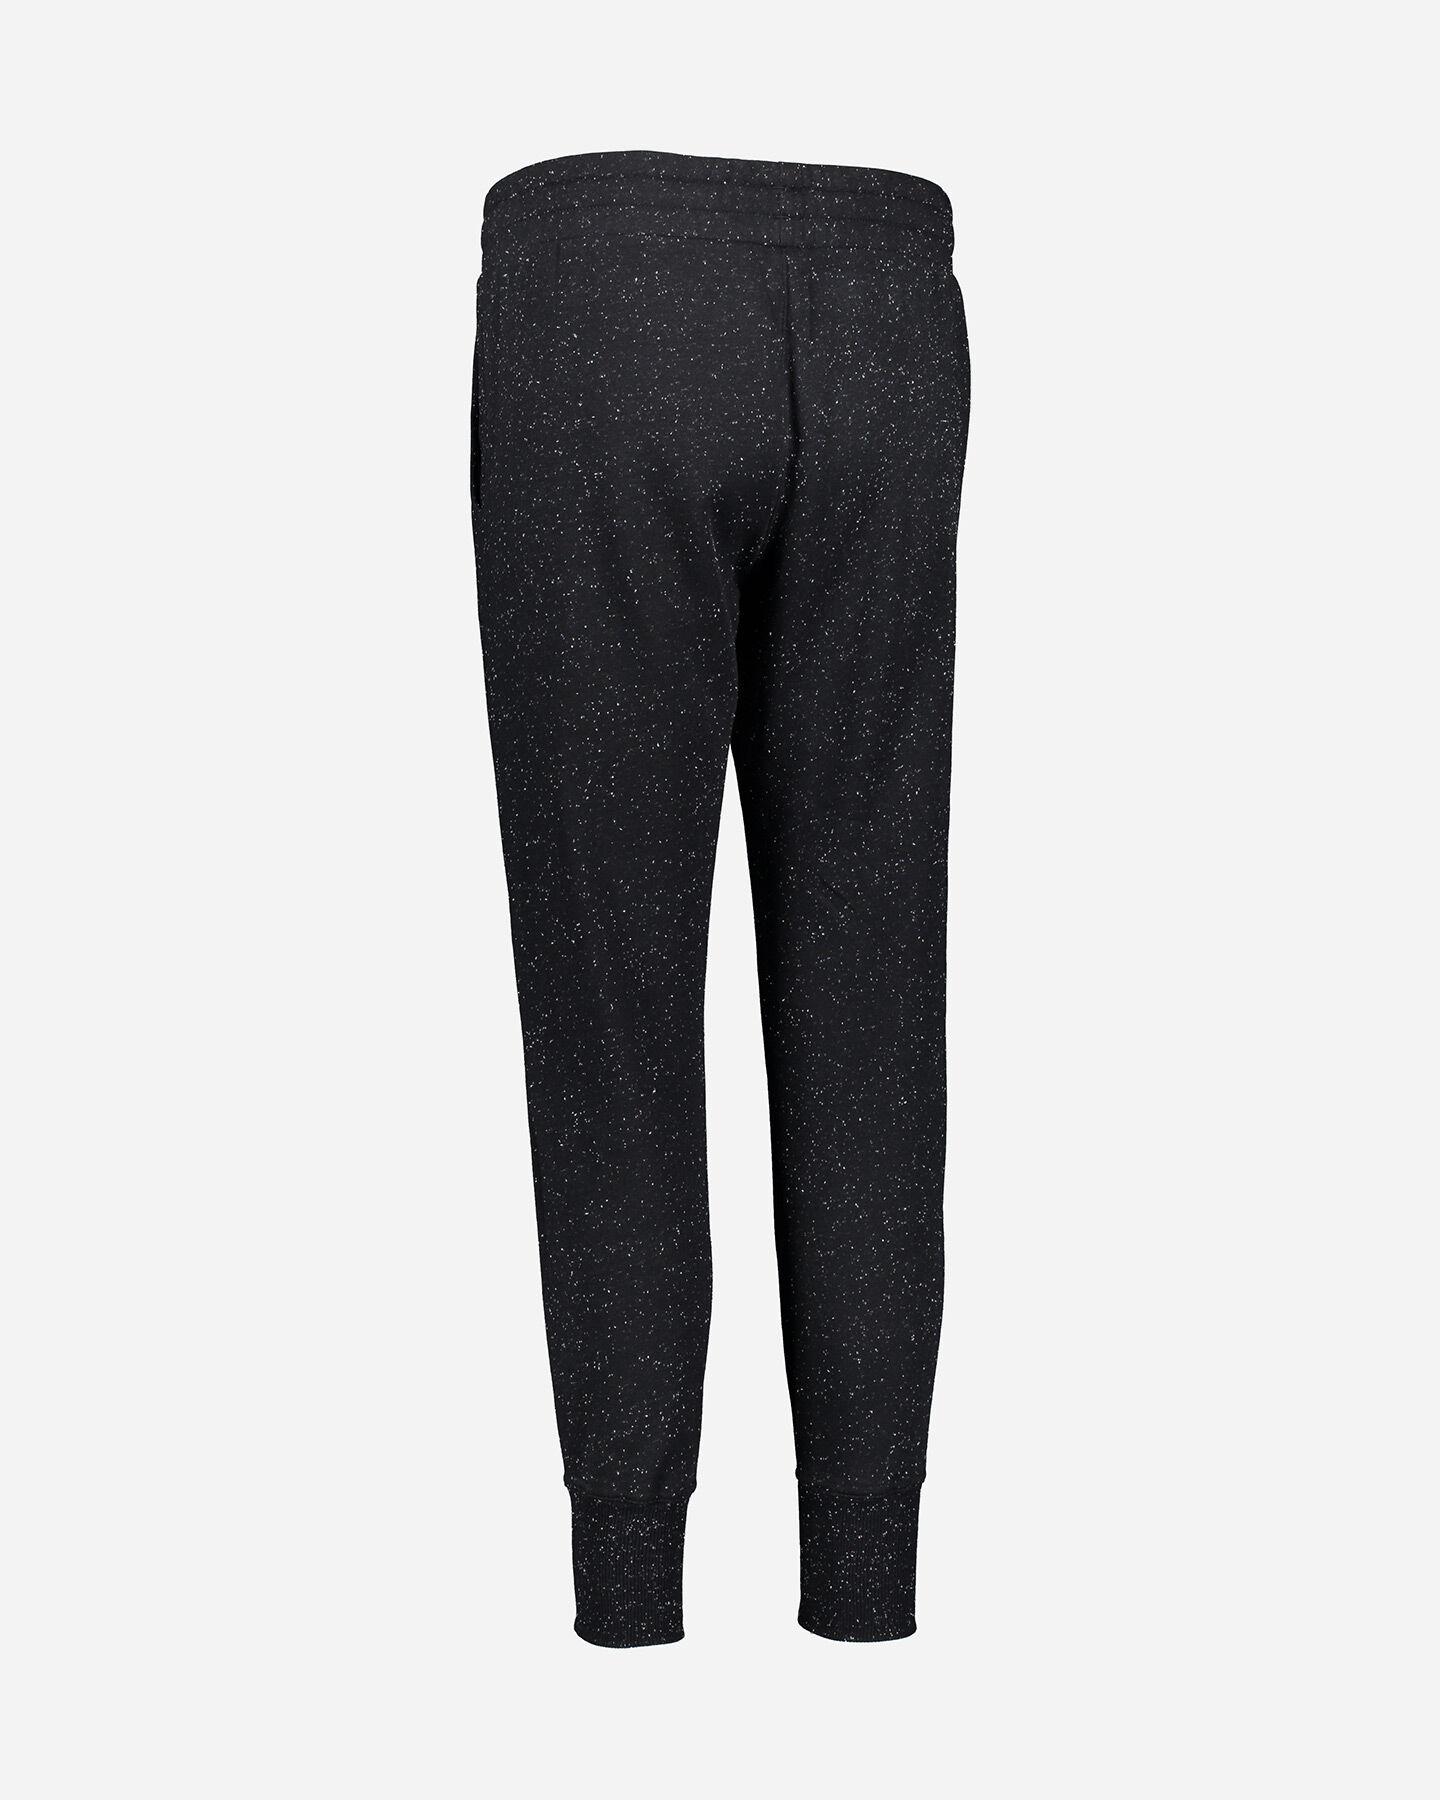 Pantalone UNDER ARMOUR RIVAL FLEECE METALLIC W S5229258 scatto 2